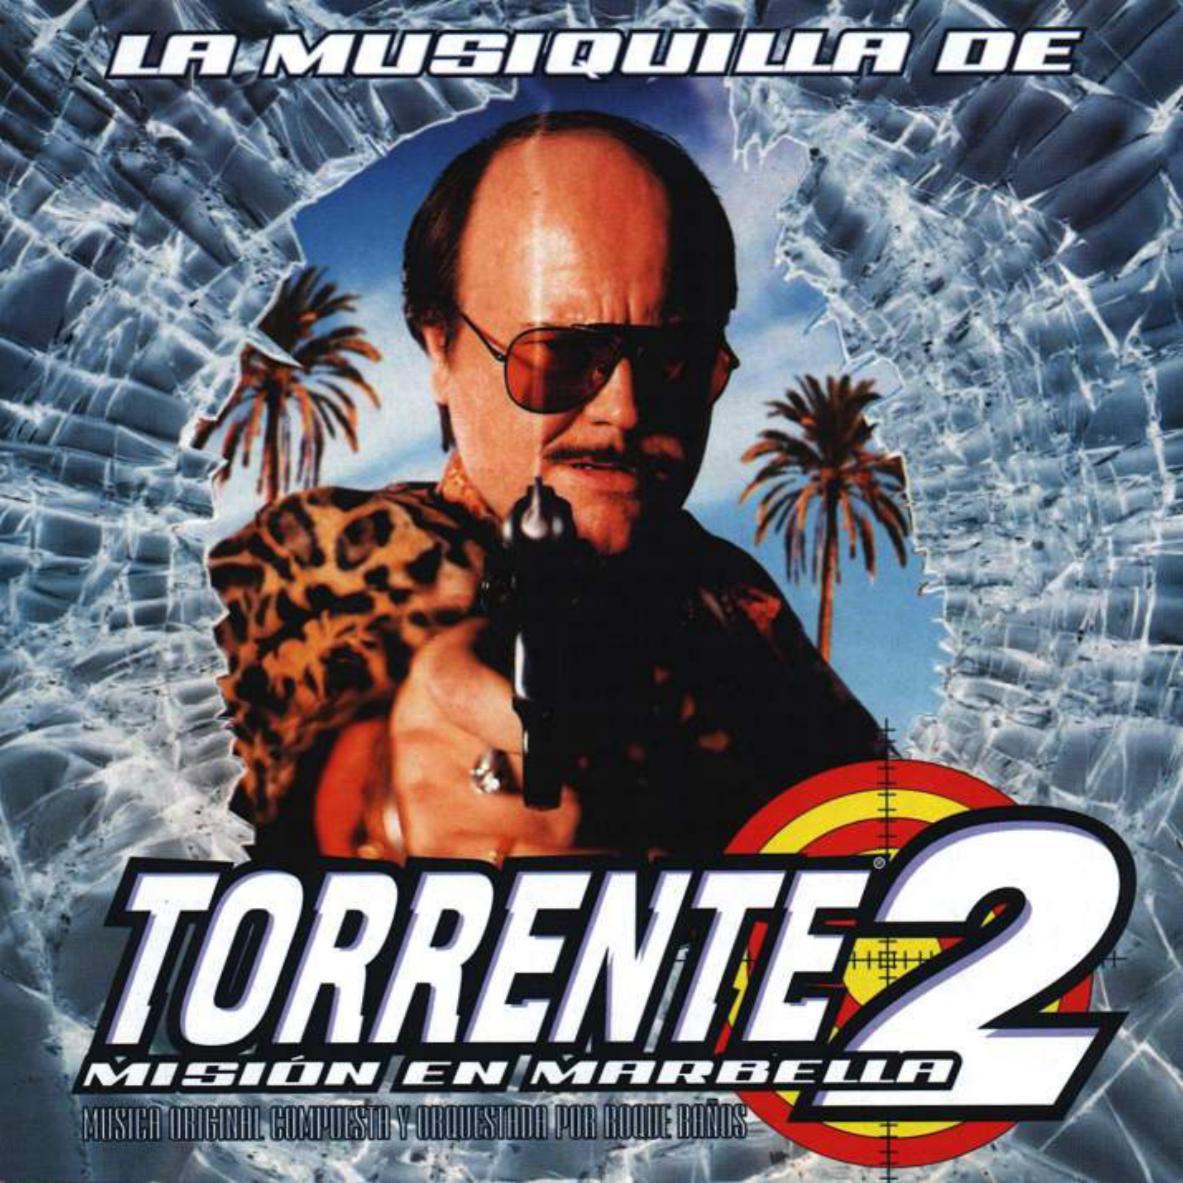 http://1.bp.blogspot.com/-tGko6VfkK5E/TanUk0_-RNI/AAAAAAAAAZo/y6mh_jDWCxU/s1600/BSO_Torrente_2--Frontal.jpg